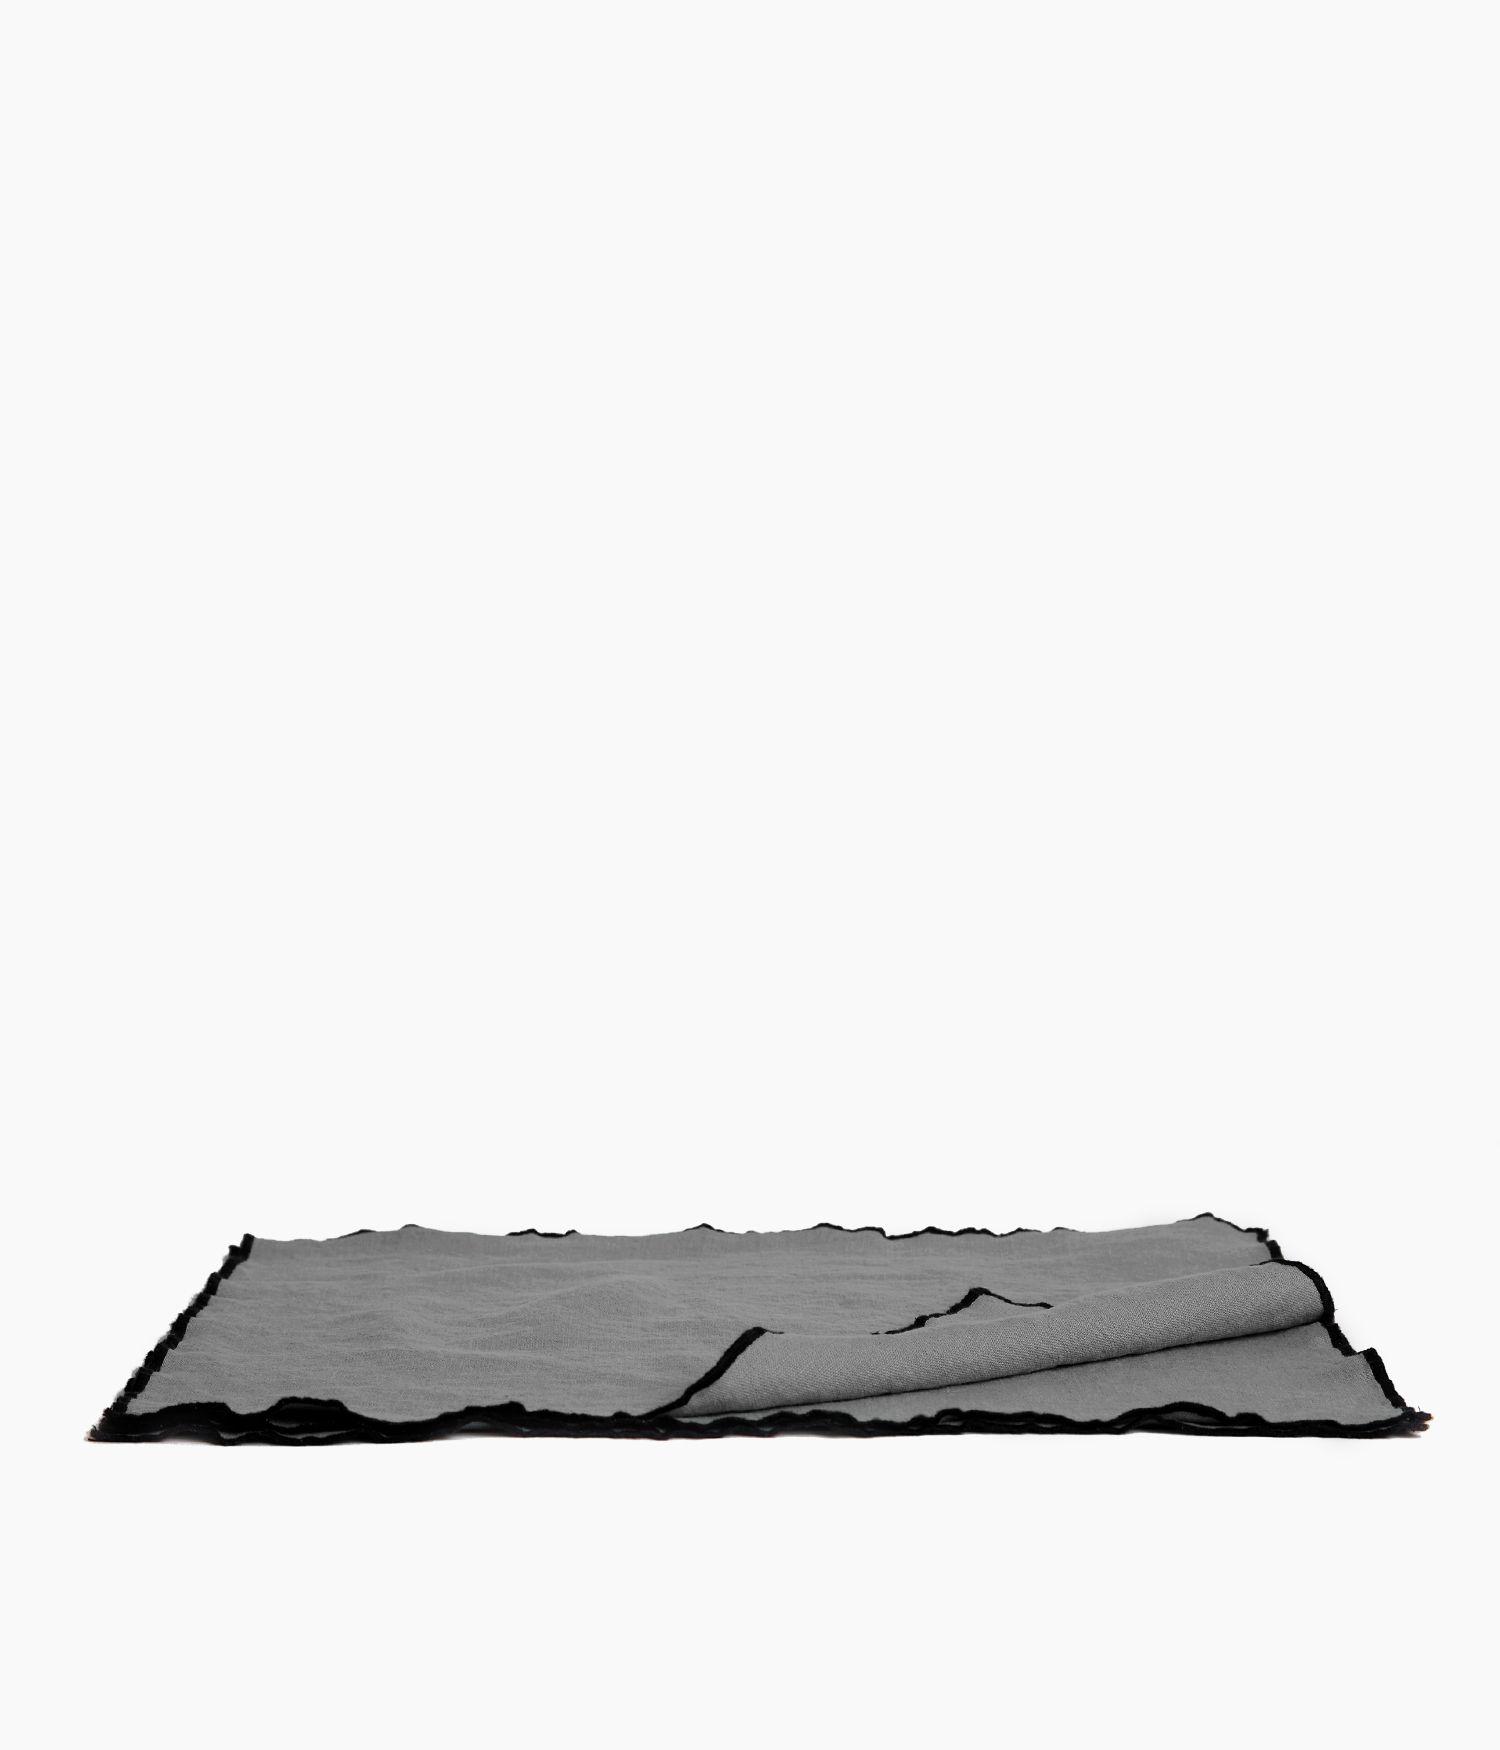 set de table 35*45 beton